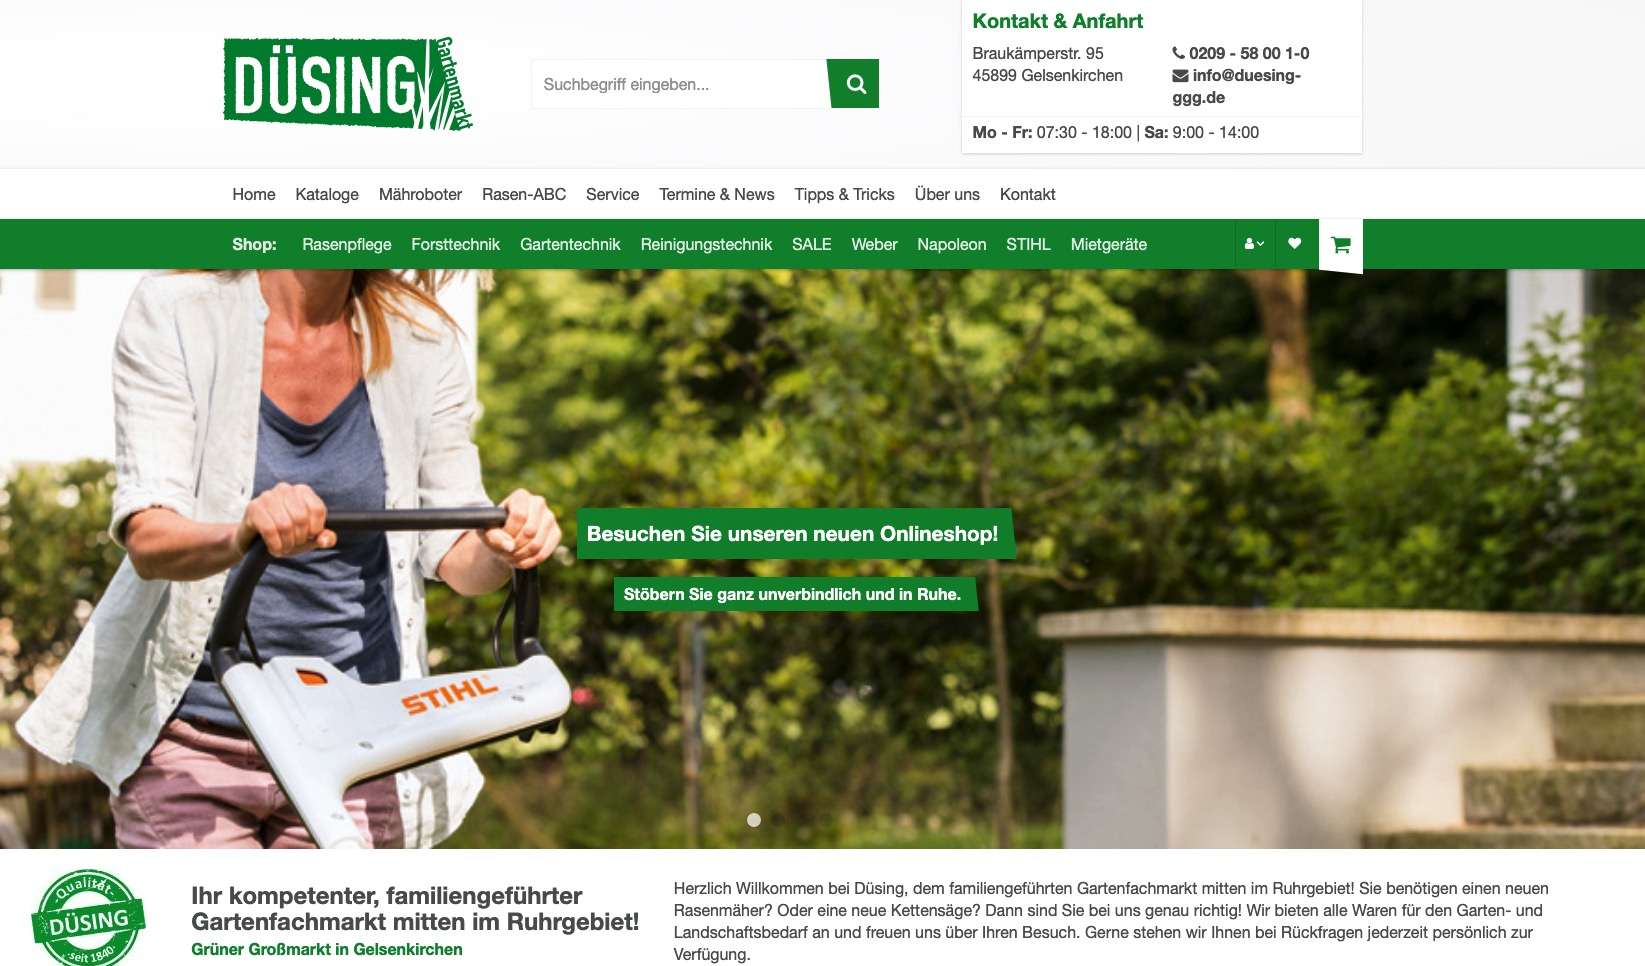 duesing-ggg.de Homepage